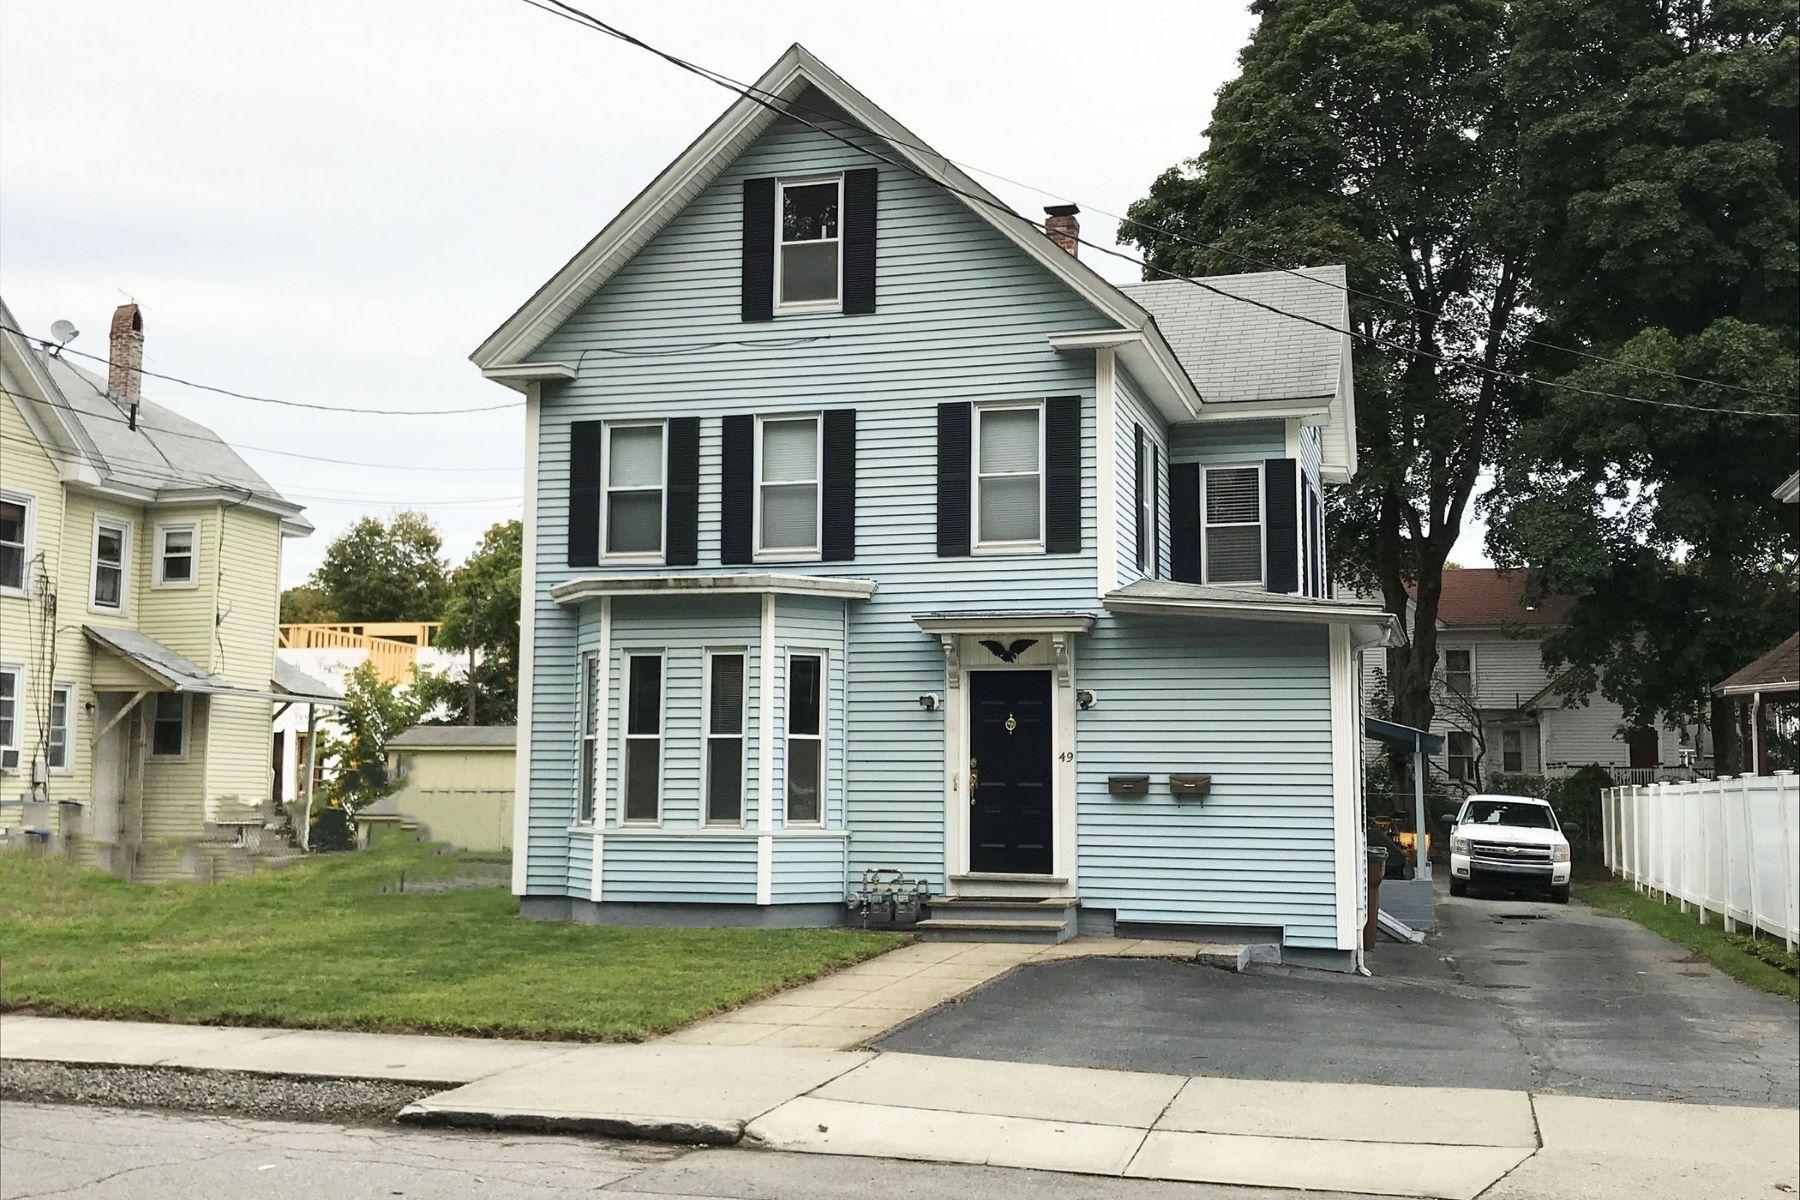 Other Residential Homes 용 매매 에 49 Pope Street 2, Hudson, 매사추세츠 01749 미국